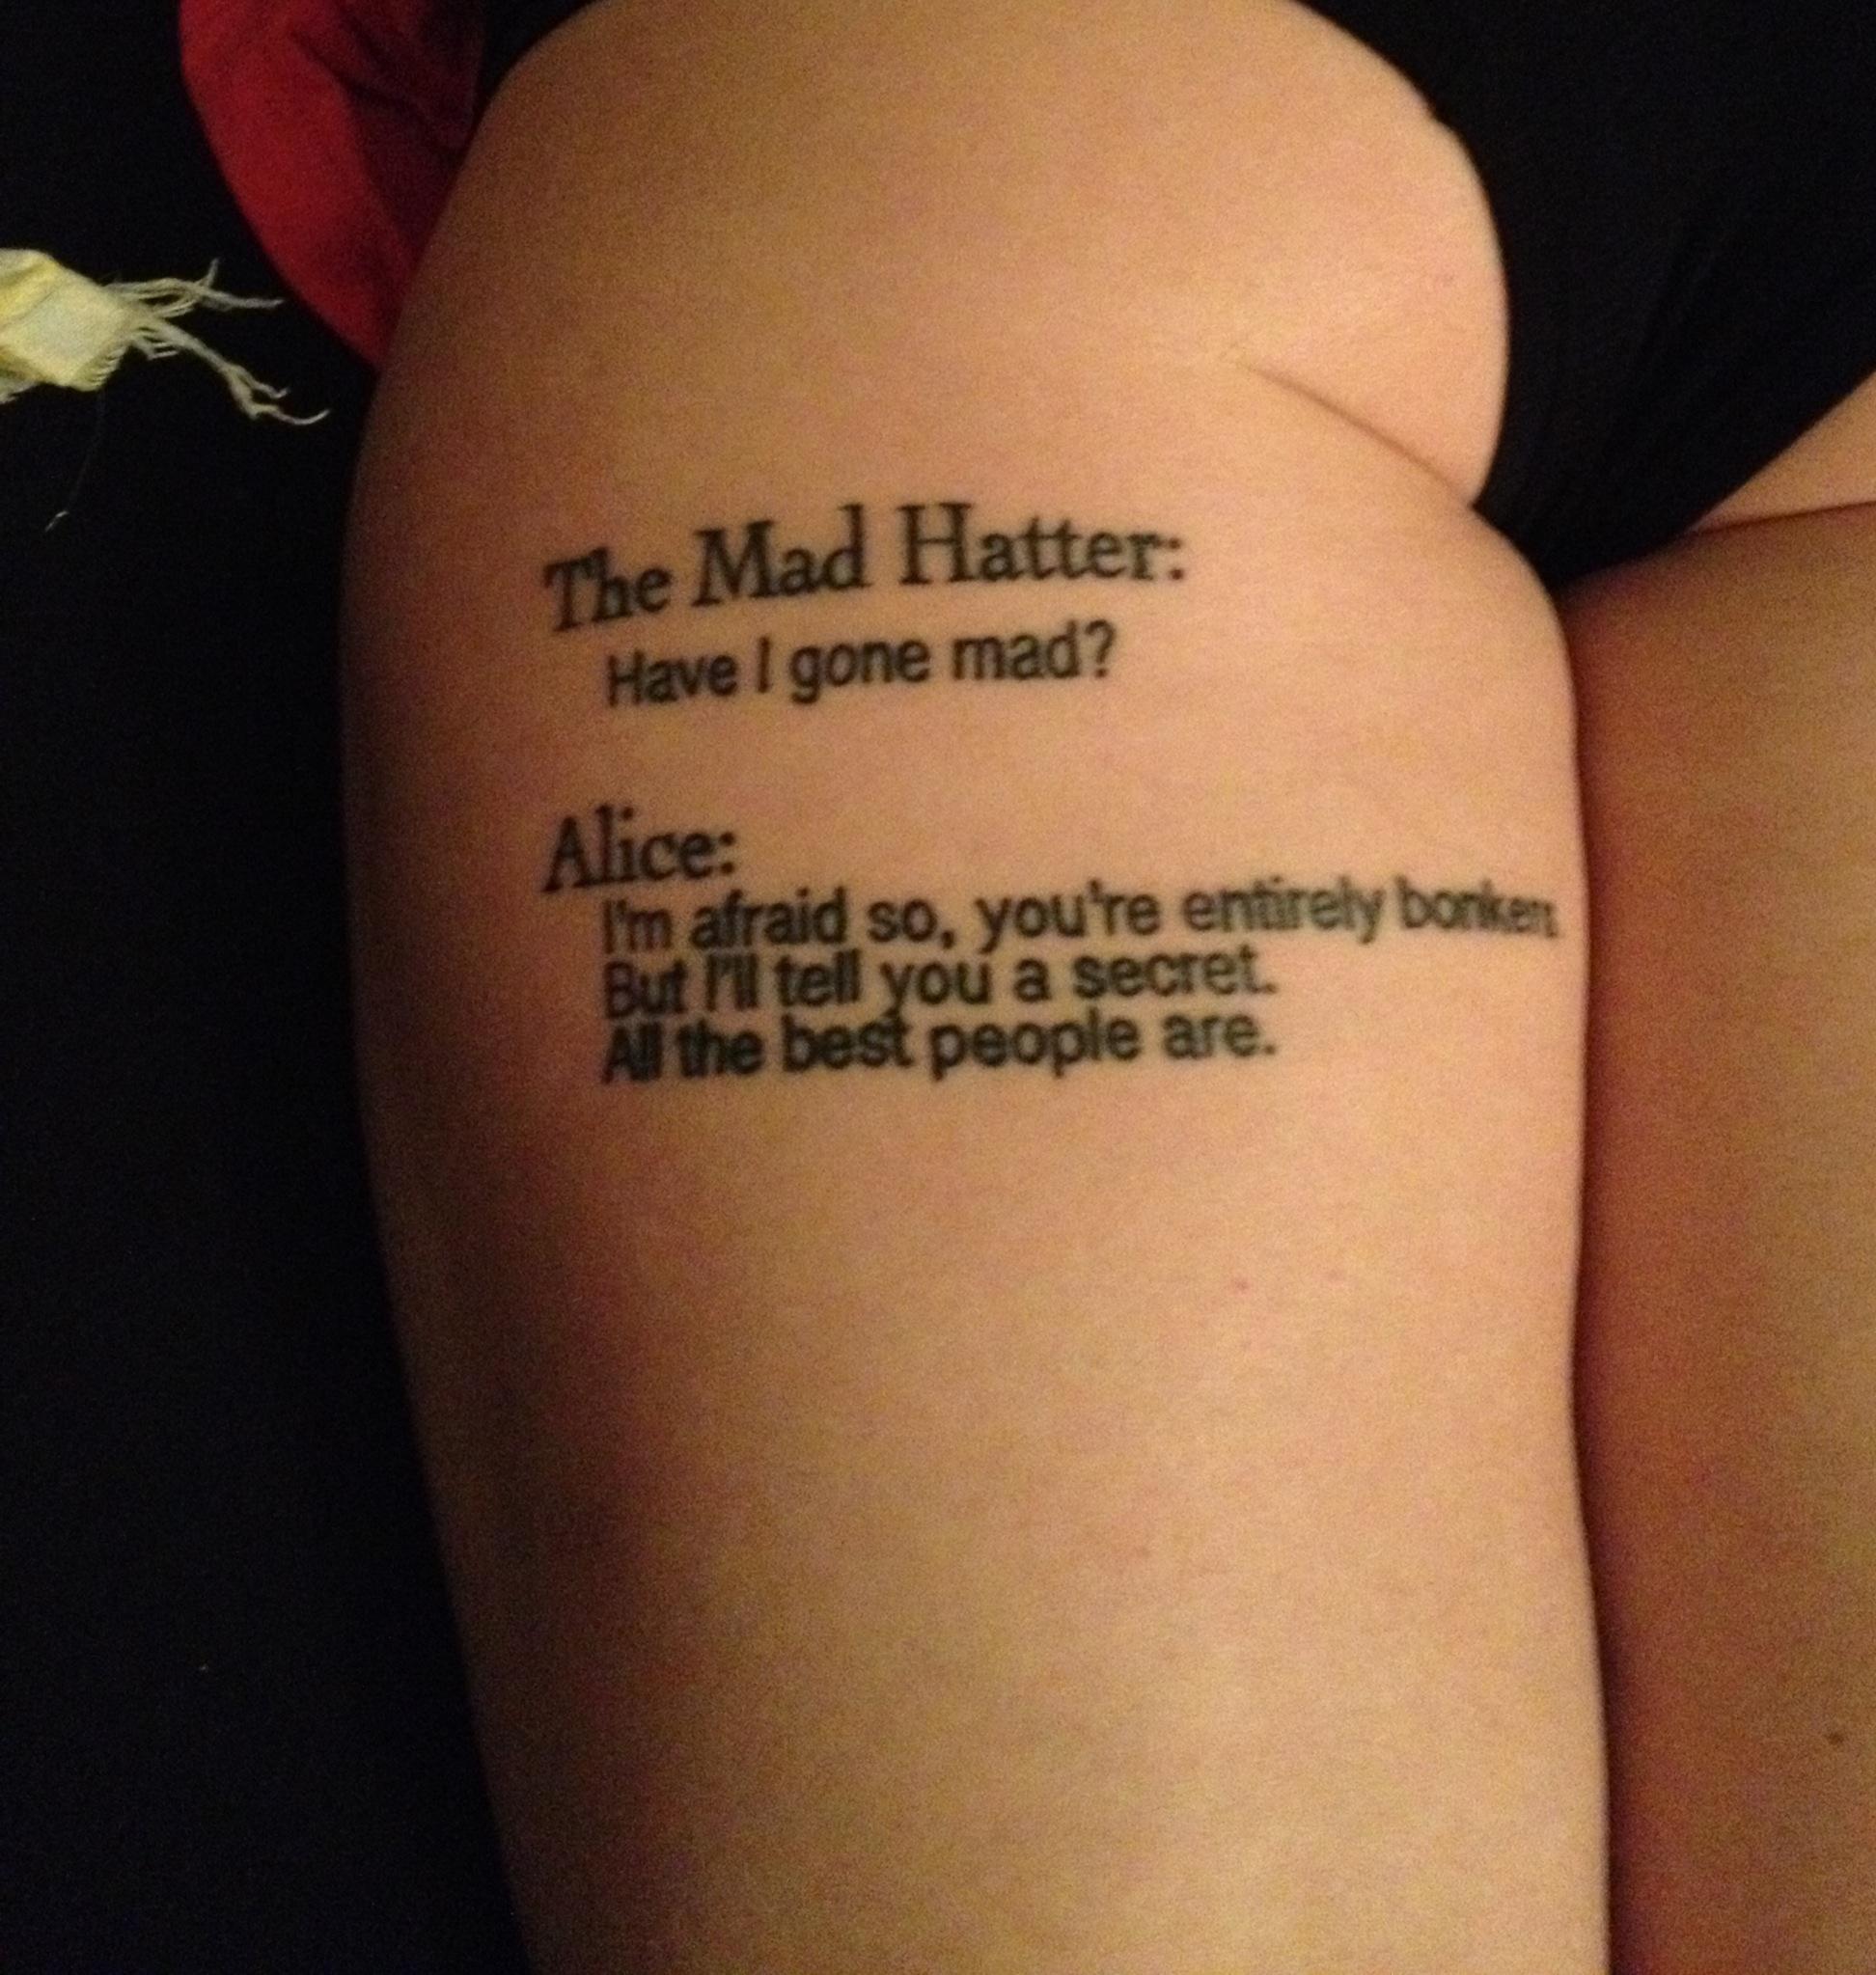 Alice In Wonderland Quote Tattoos: Tattoo Quotes About Drugs. QuotesGram